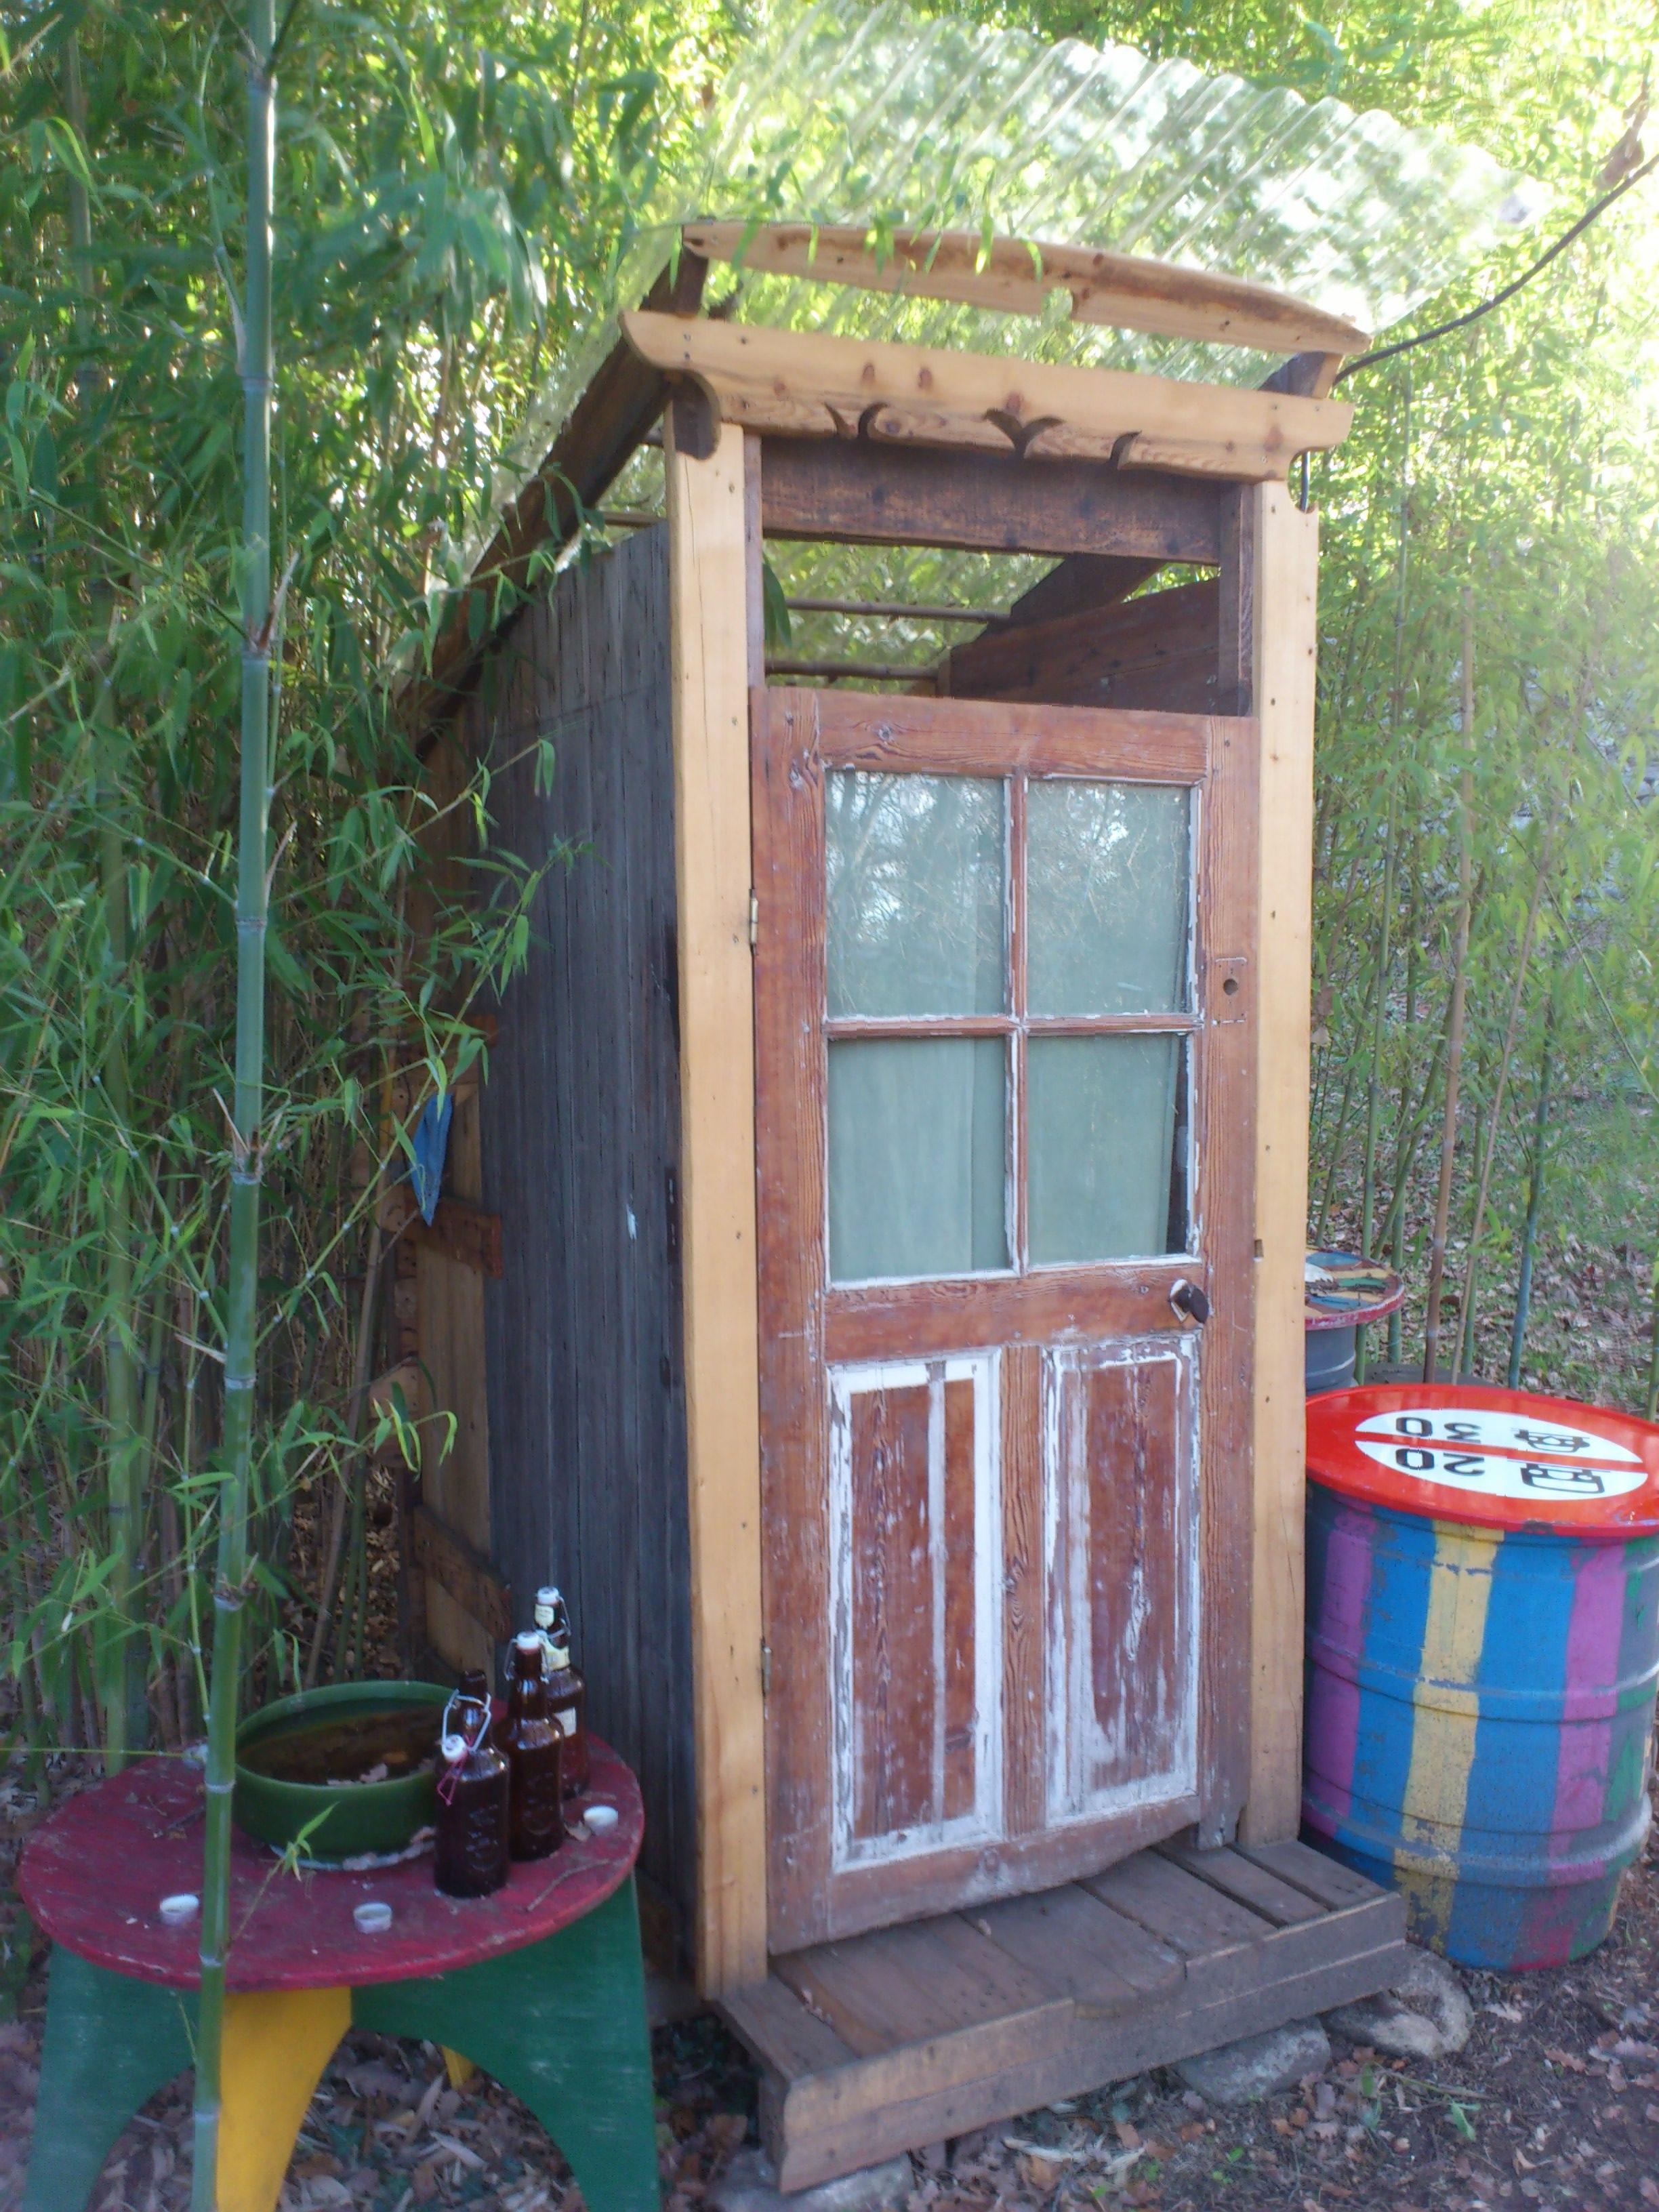 Le cabanon wc sec